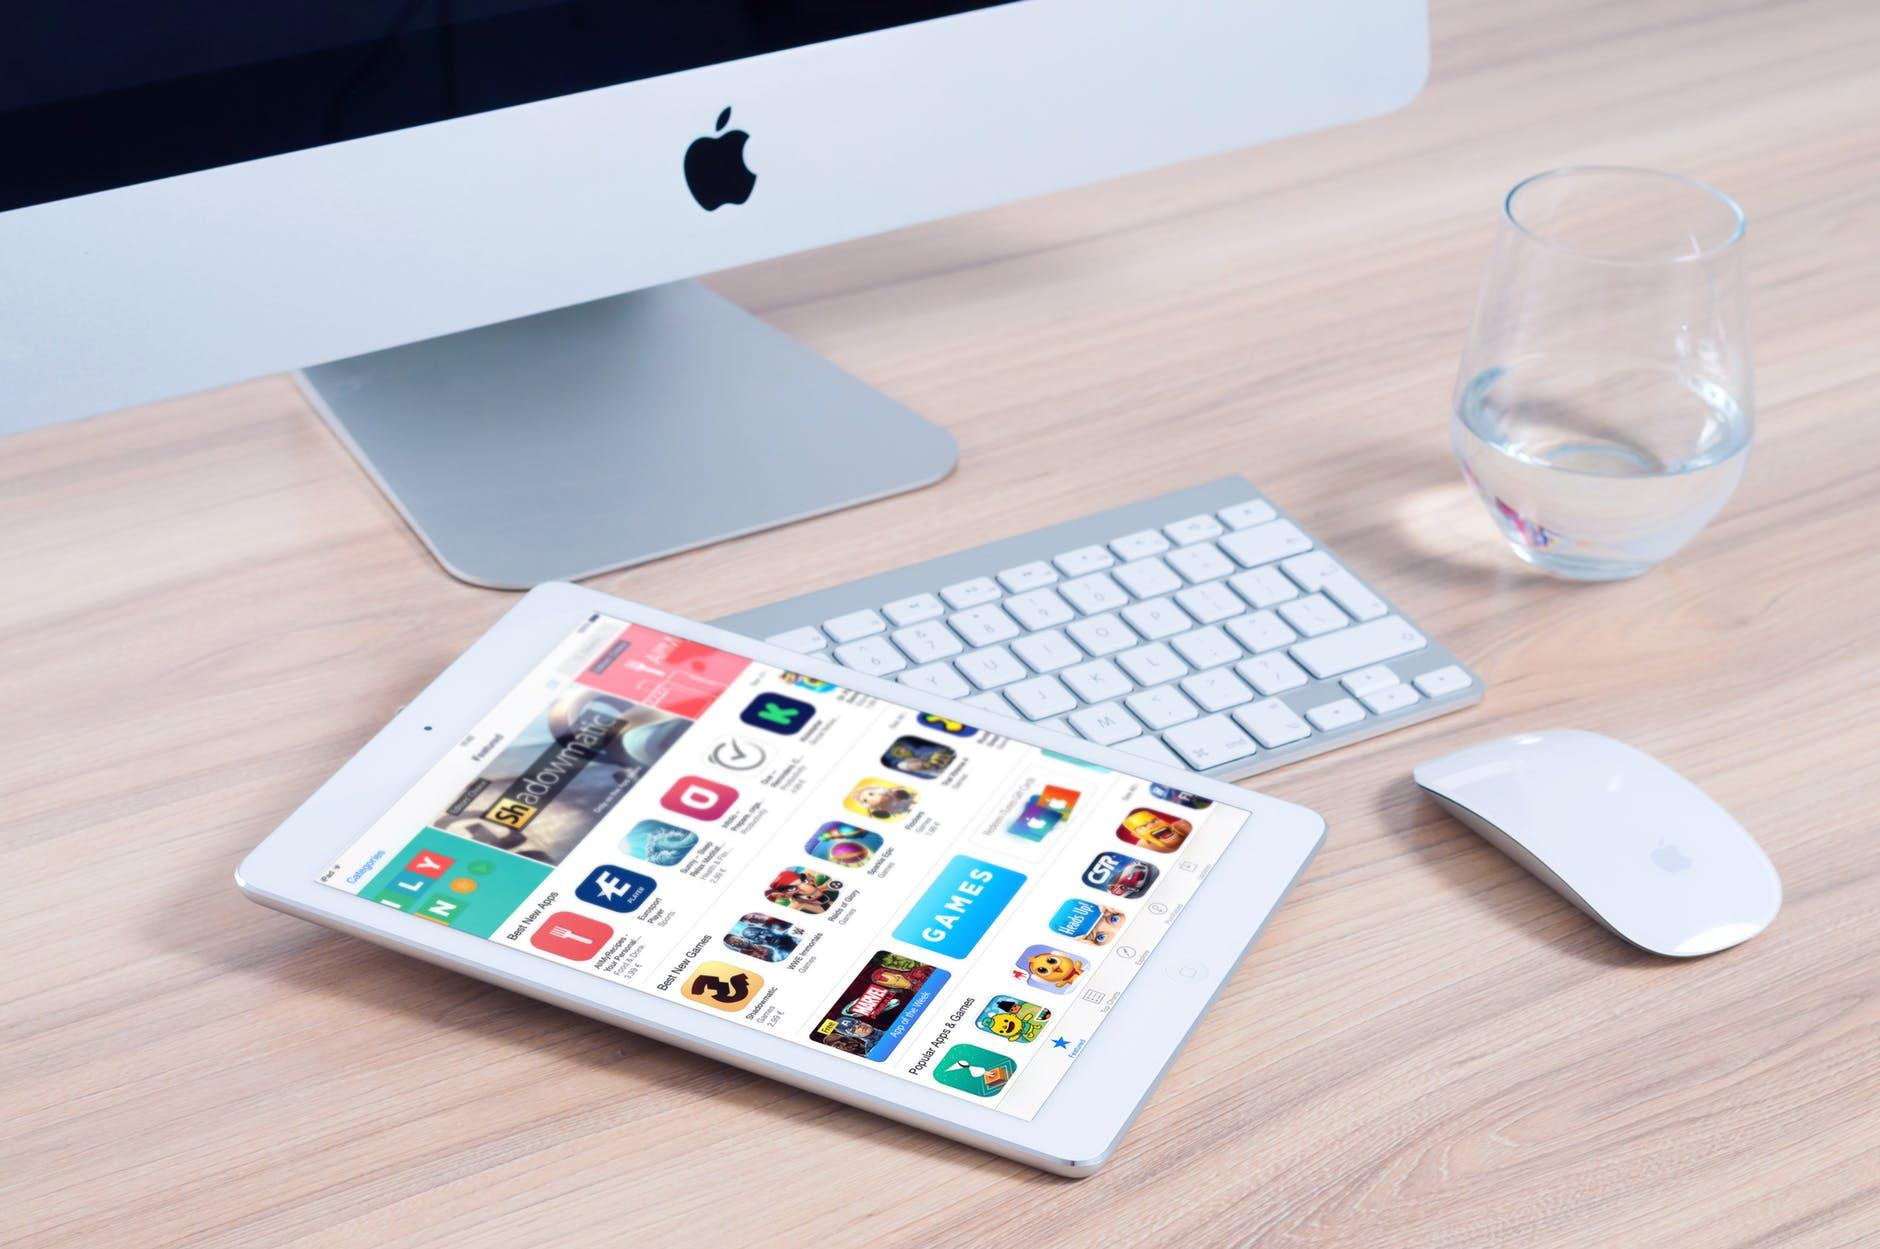 apple office internet ipad